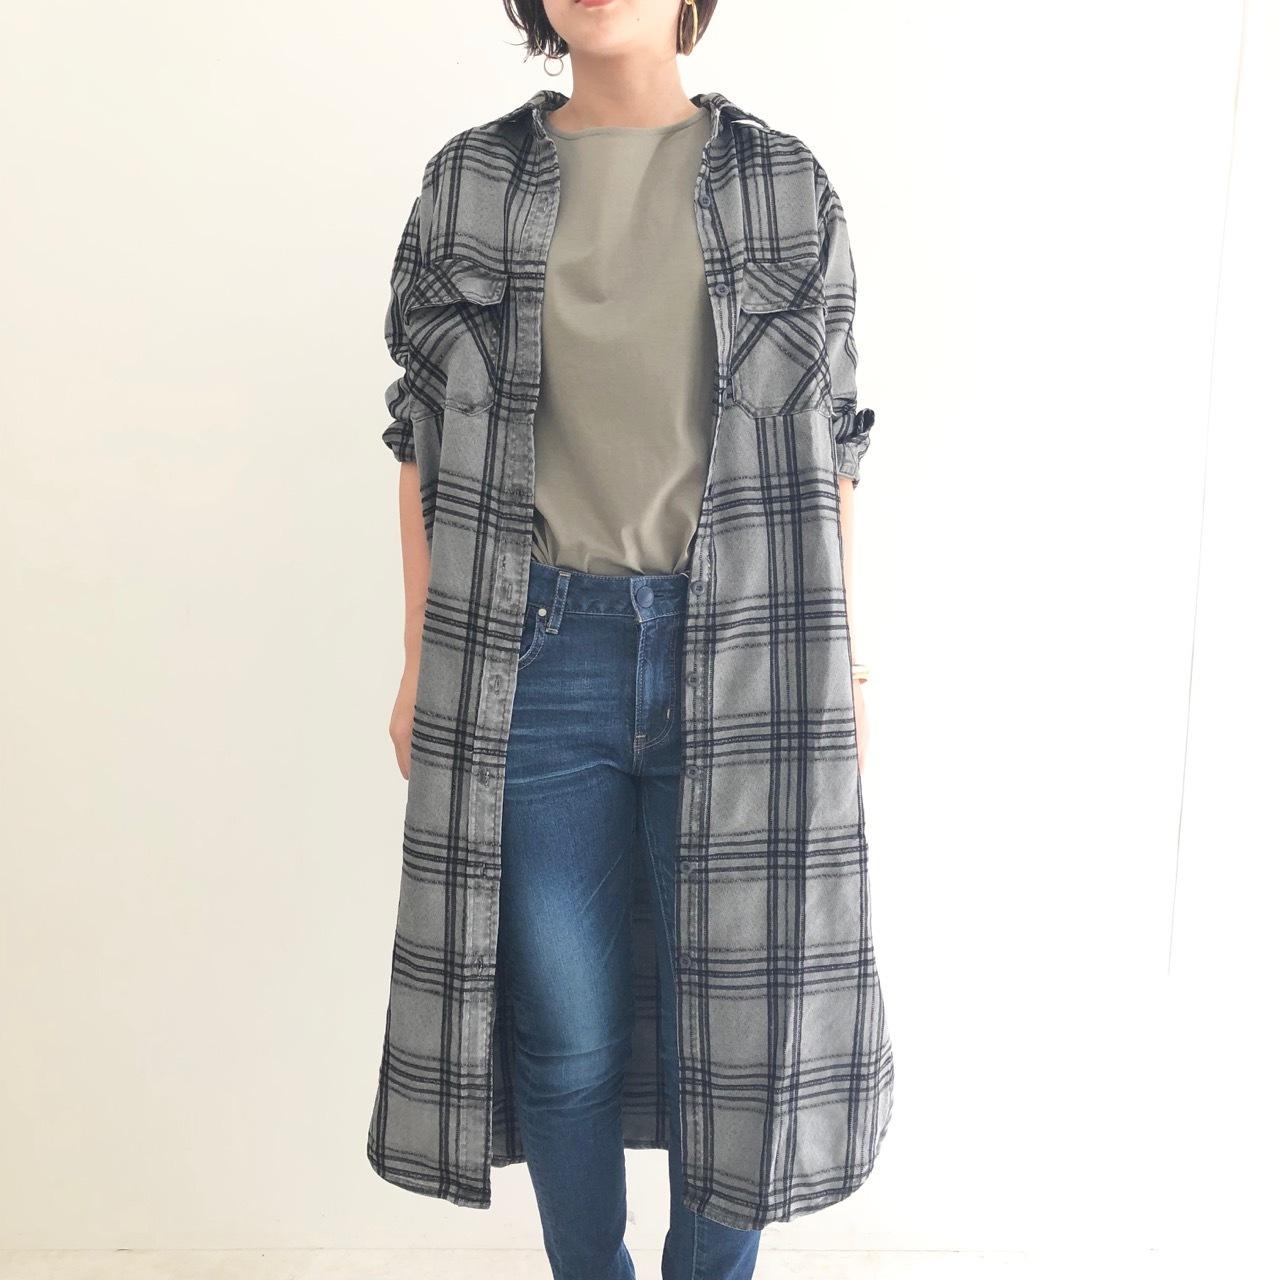 【 flamingo firm 】- 150139 - ロングチェックシャツ